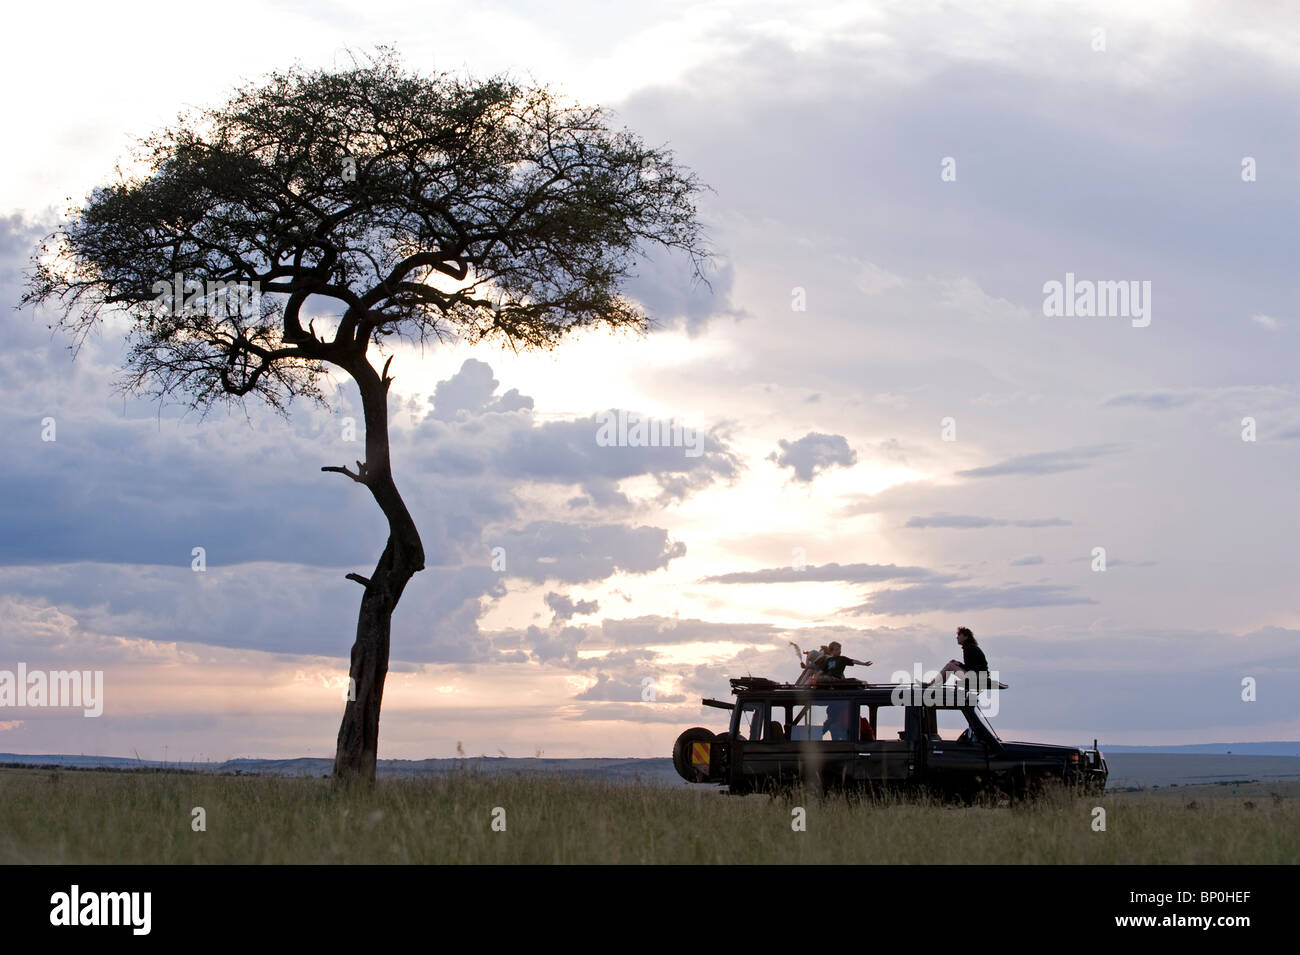 Kenya, Masai Mara. A stop for a break in a game drive beside one of the Mara's classic balanites trees. (MR) - Stock Image